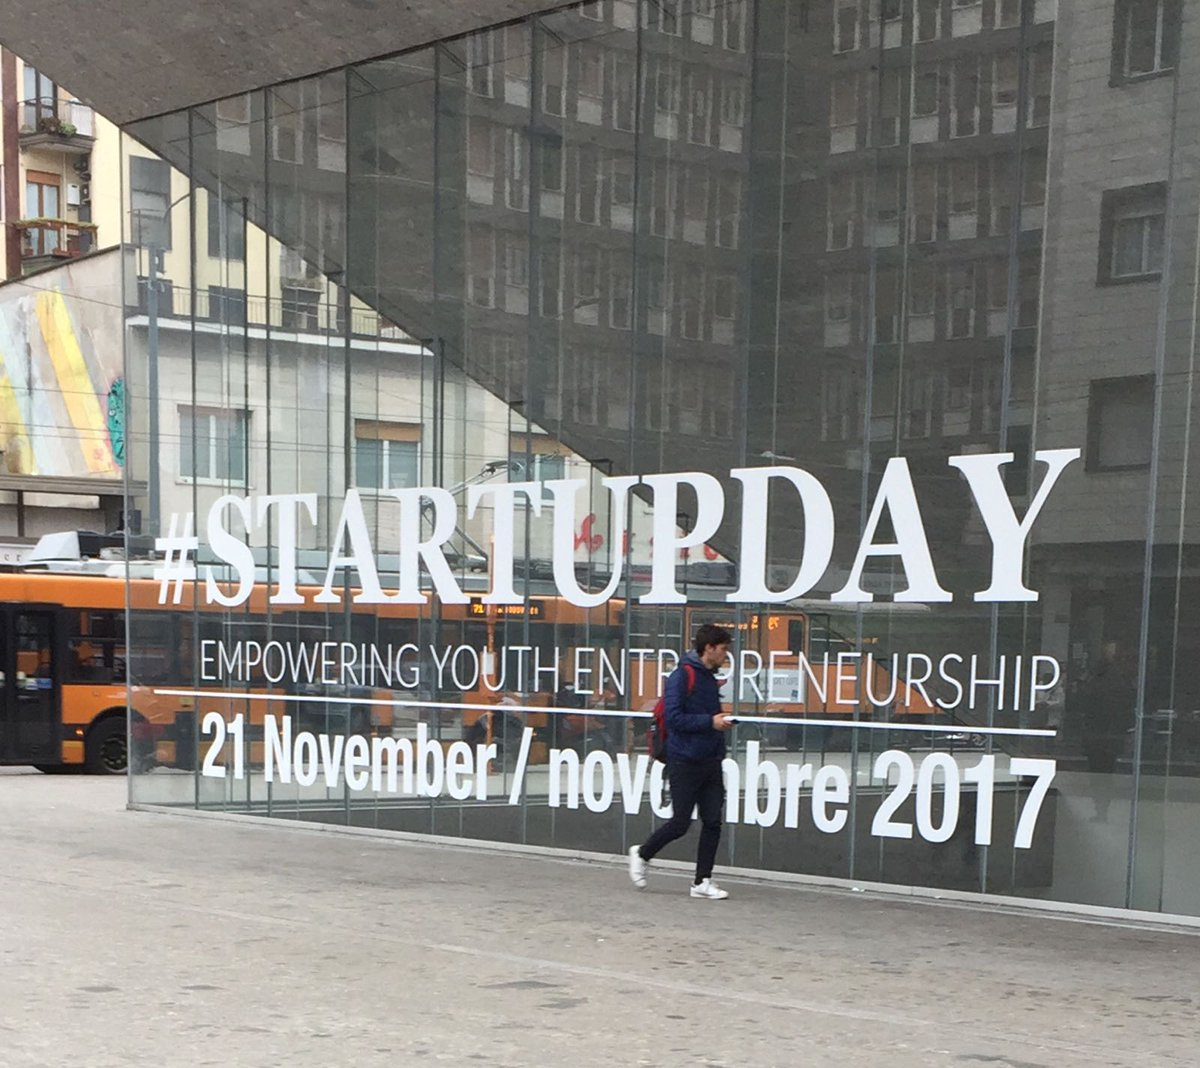 #StartupDay